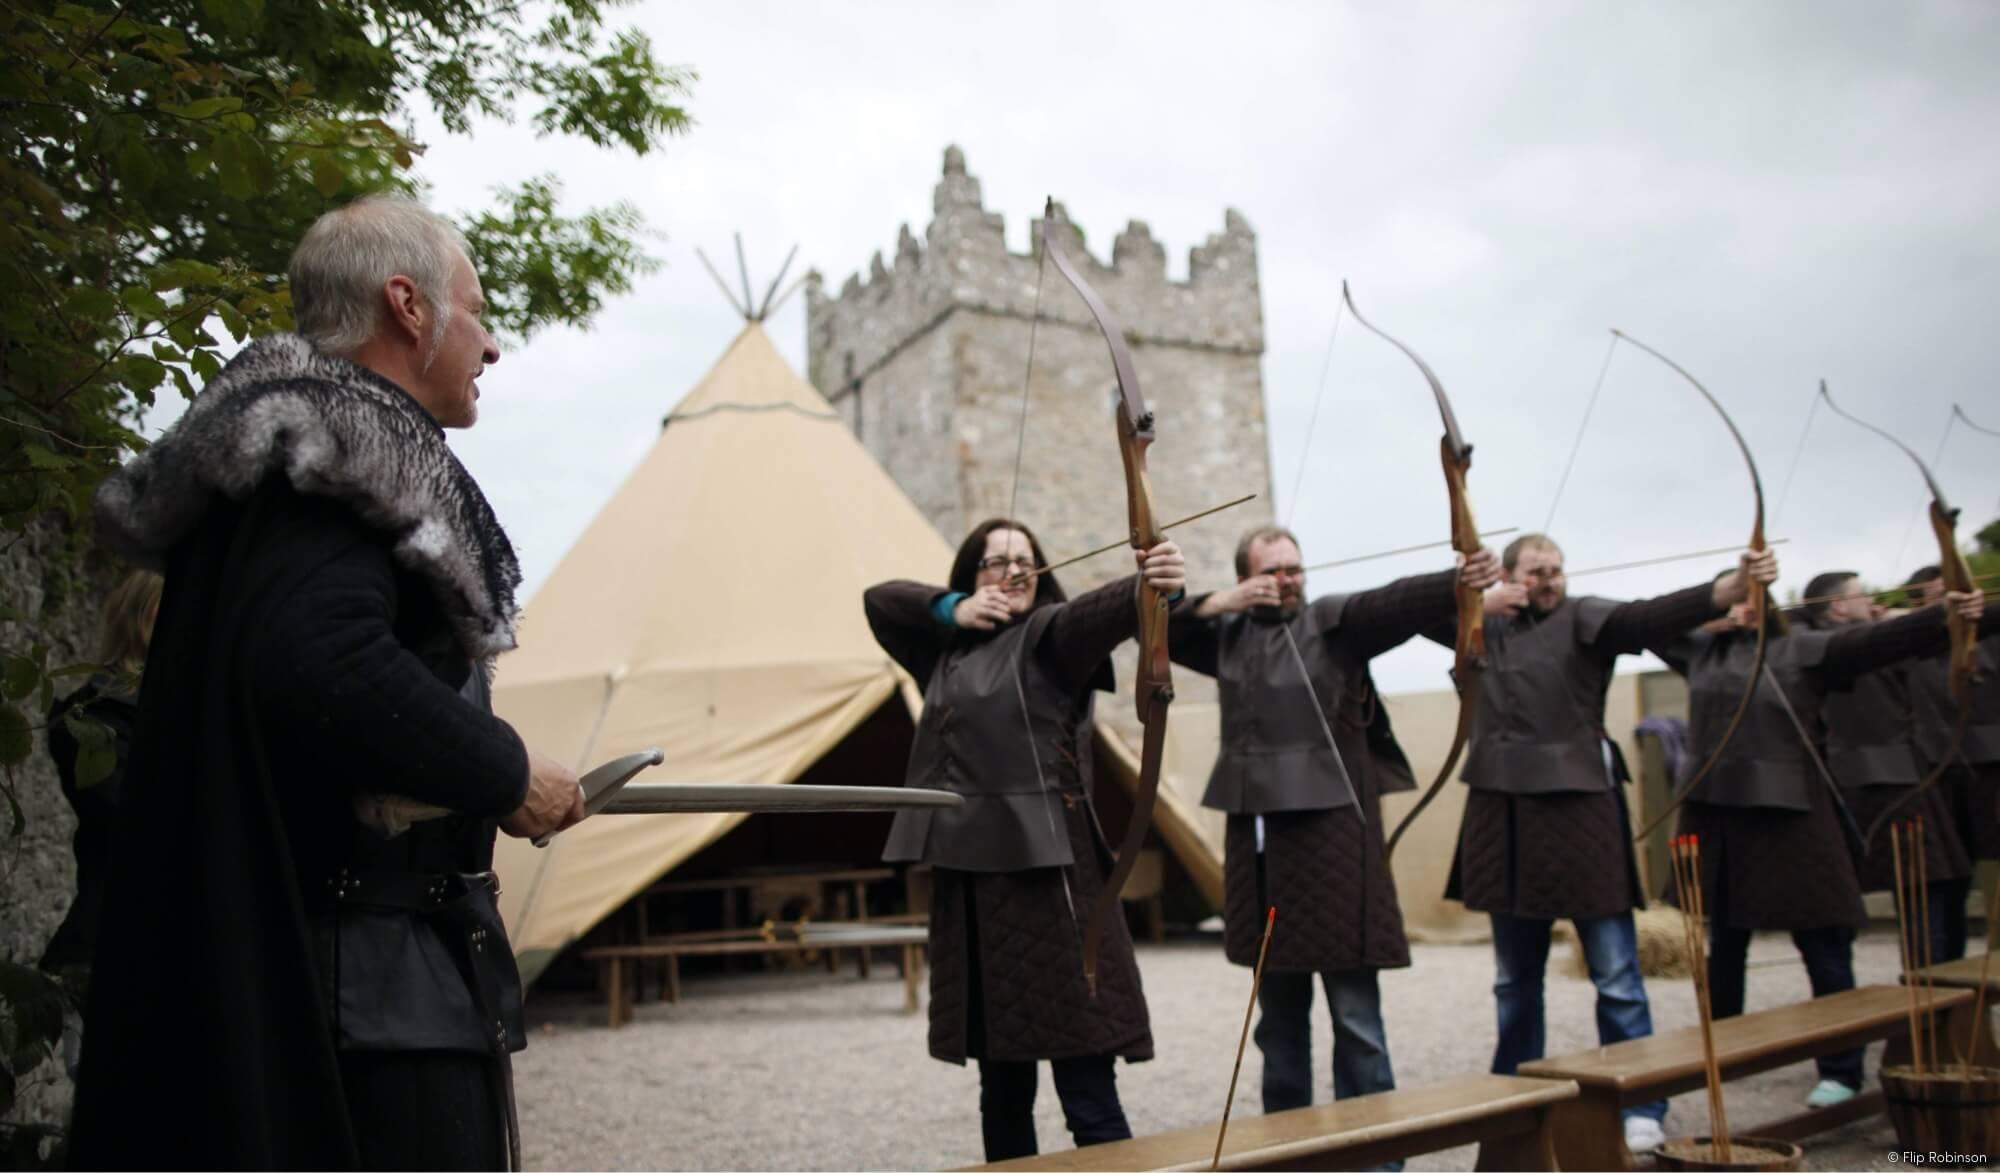 Medieval Bow & Arrow Practise'